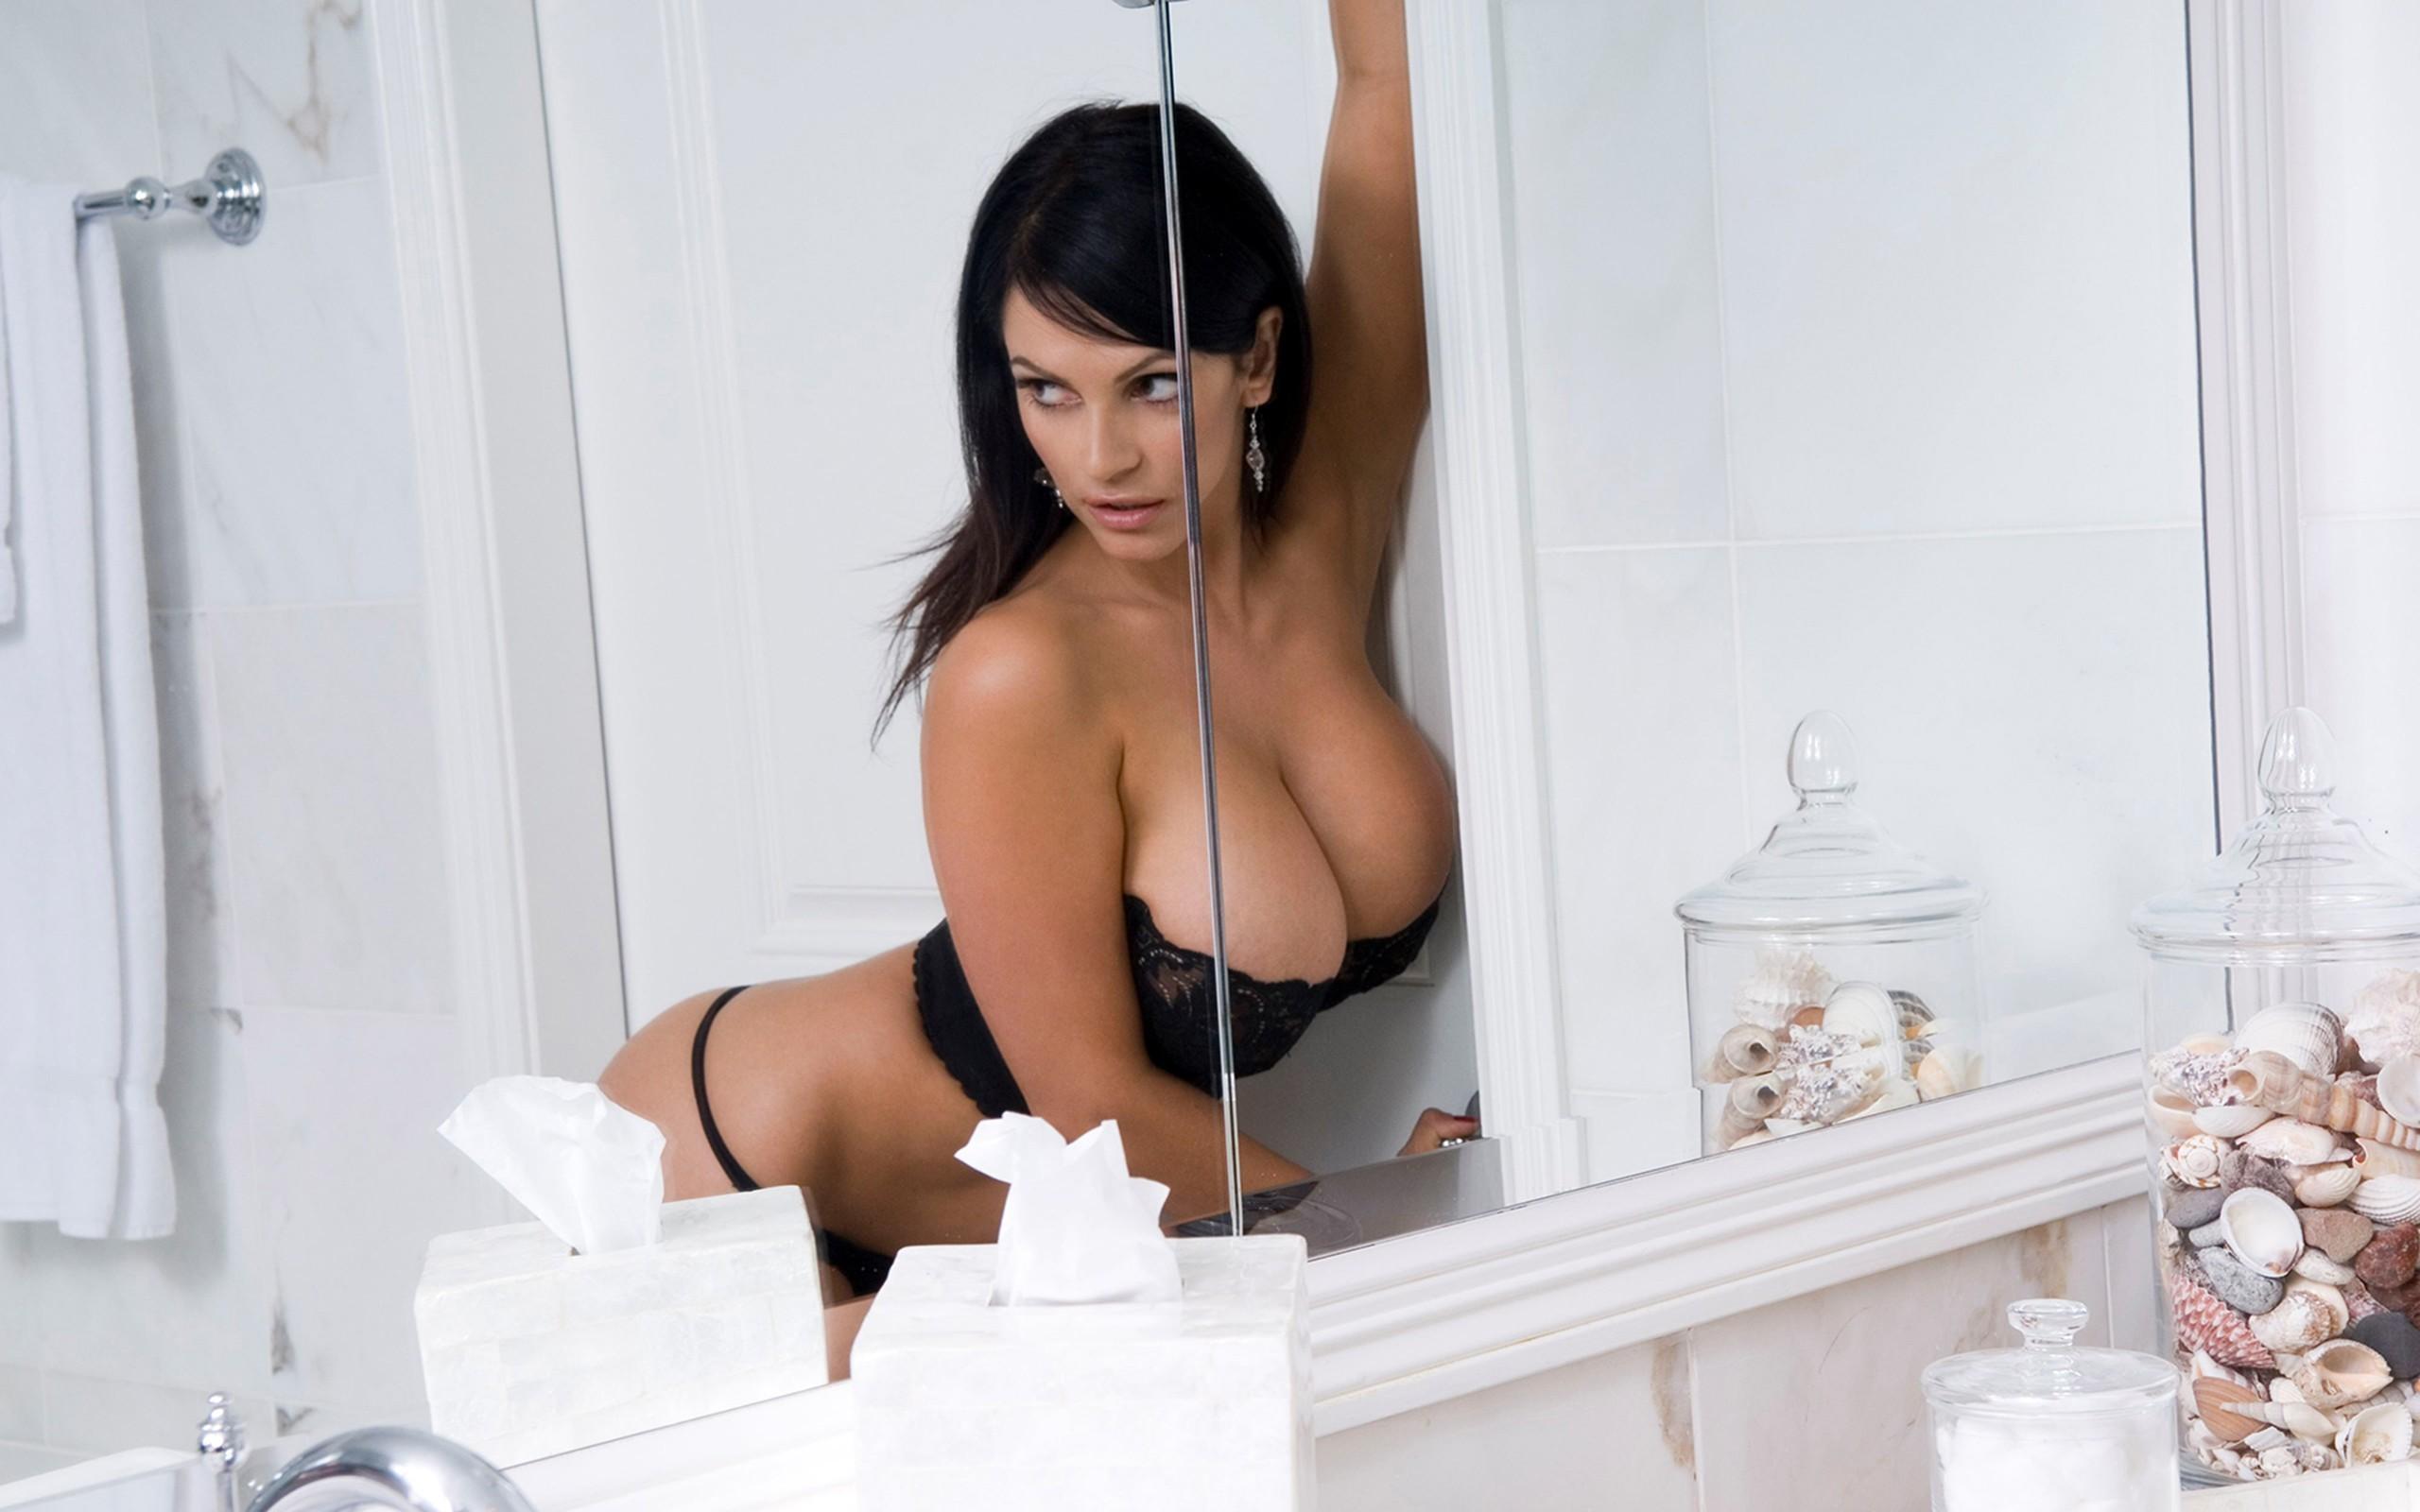 Best Images Of Denise Milani